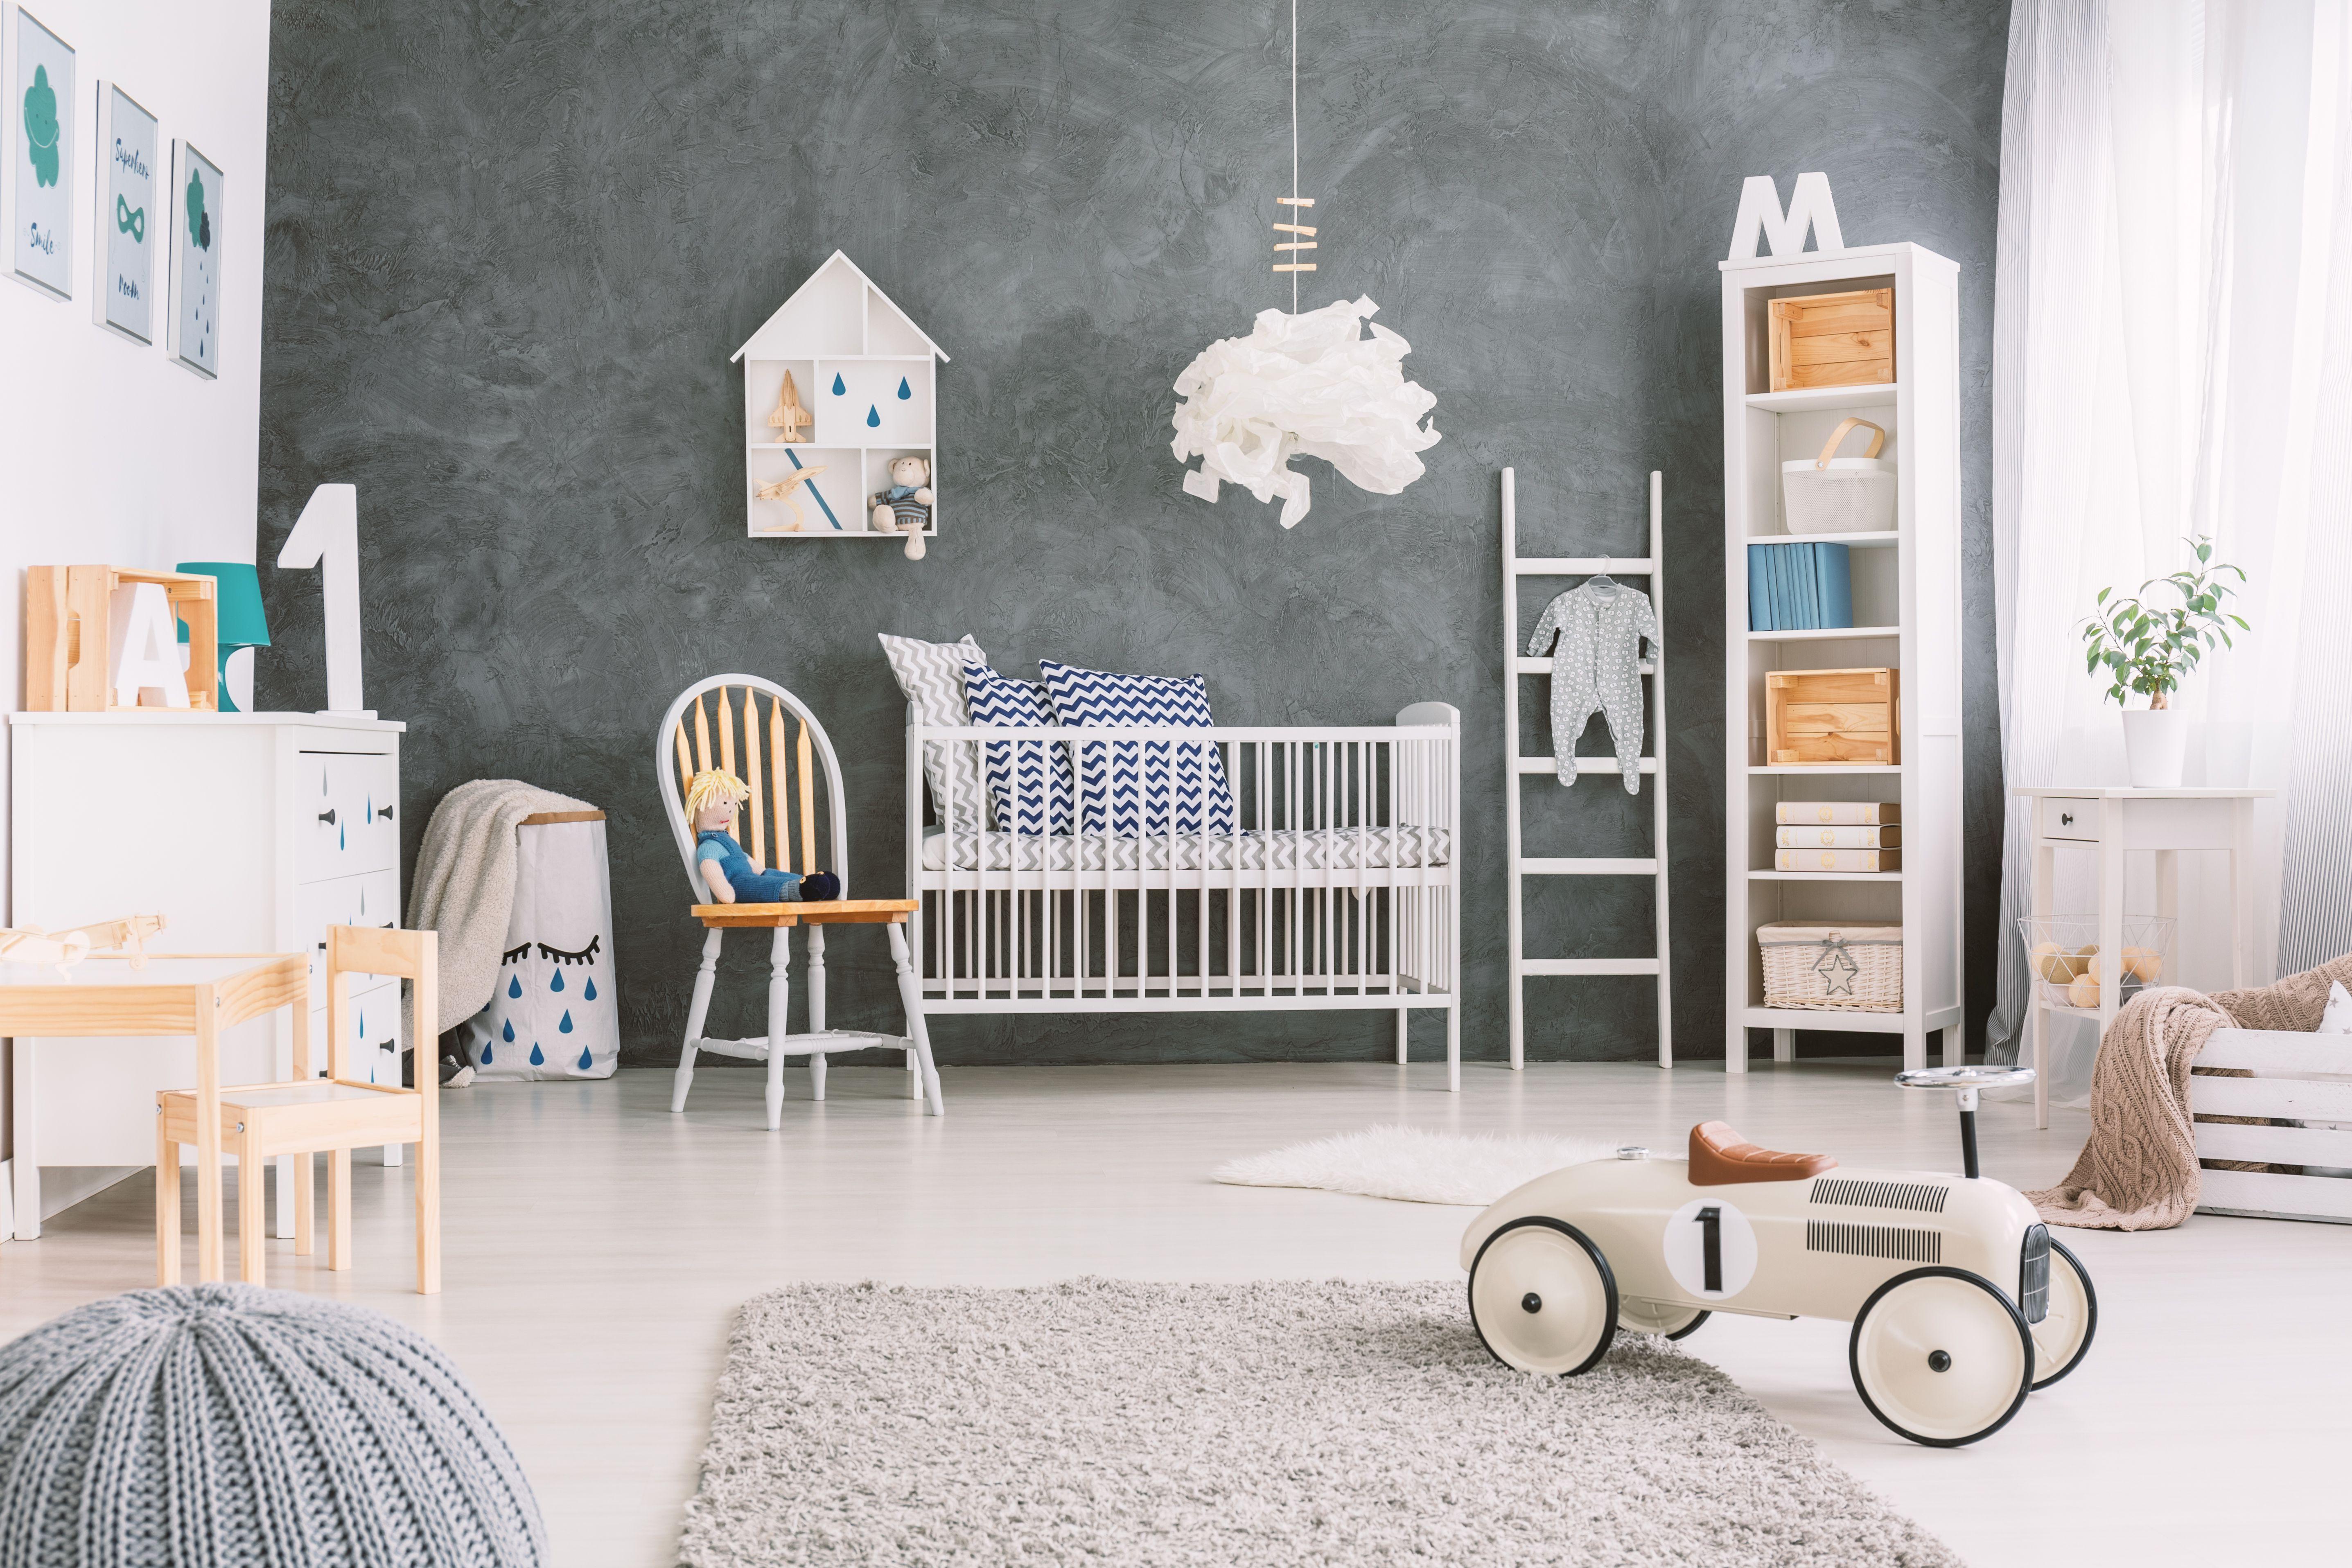 Nursery 101 How to Decorate a Nursery